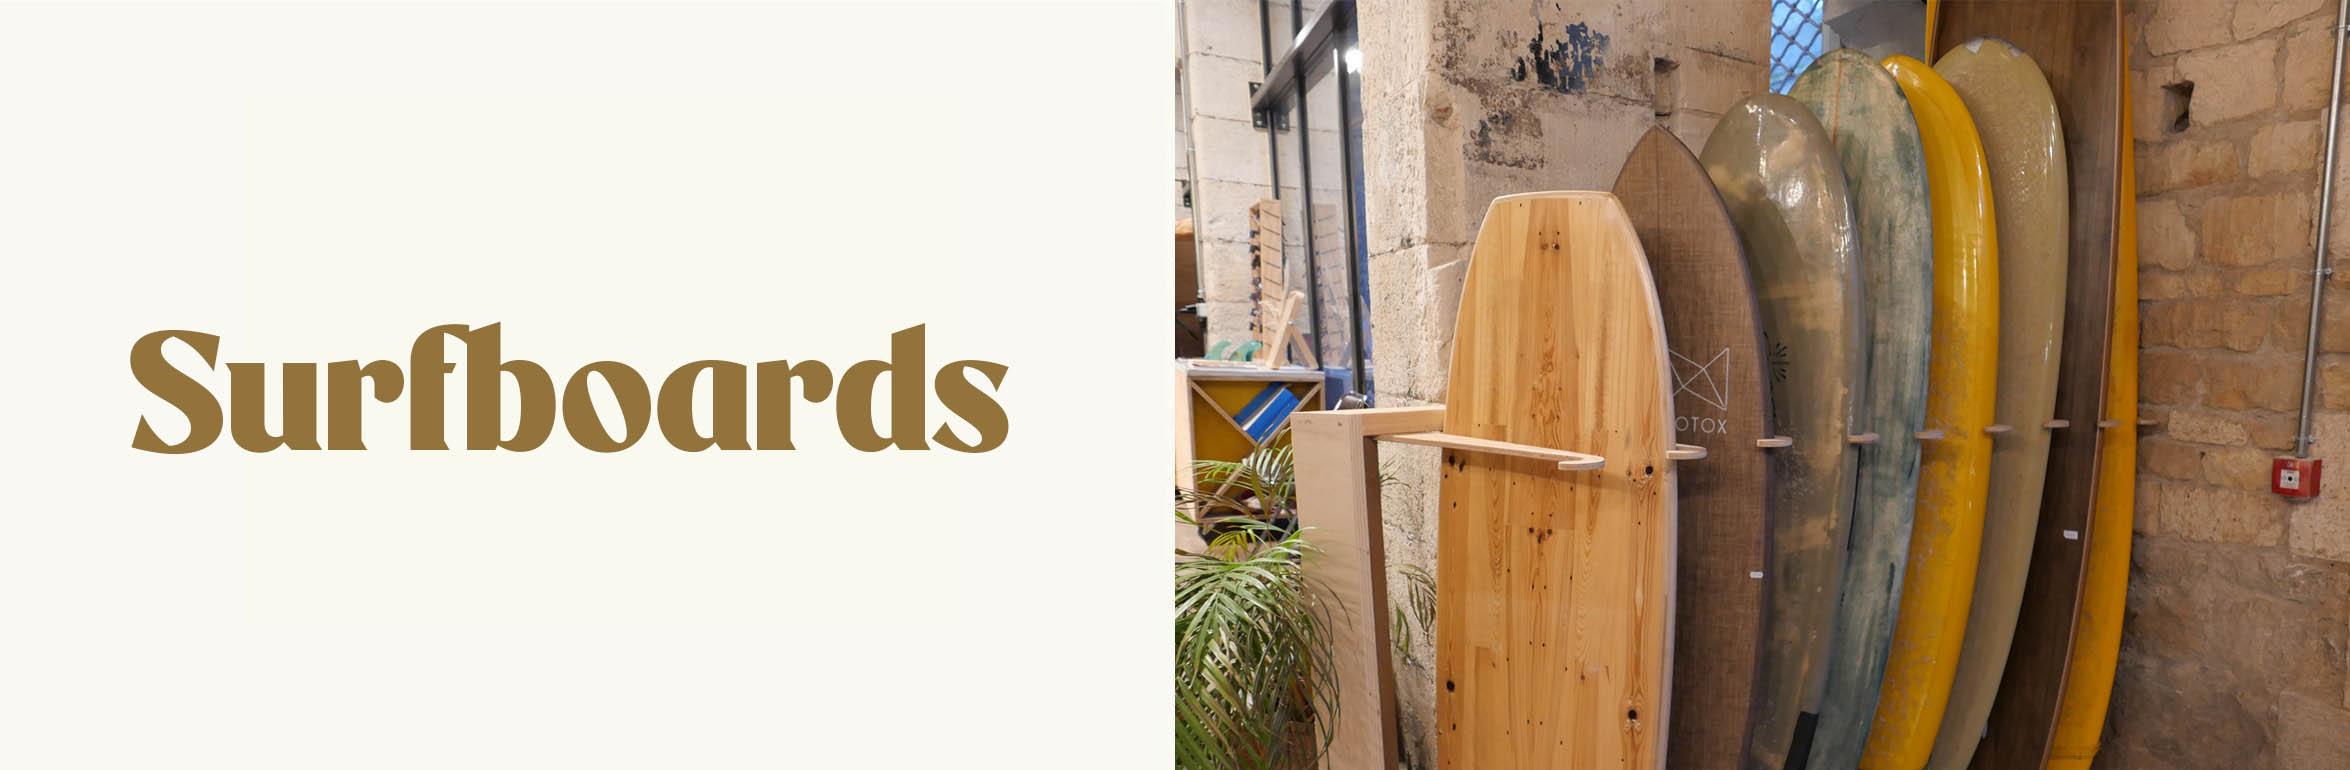 organic surfboards